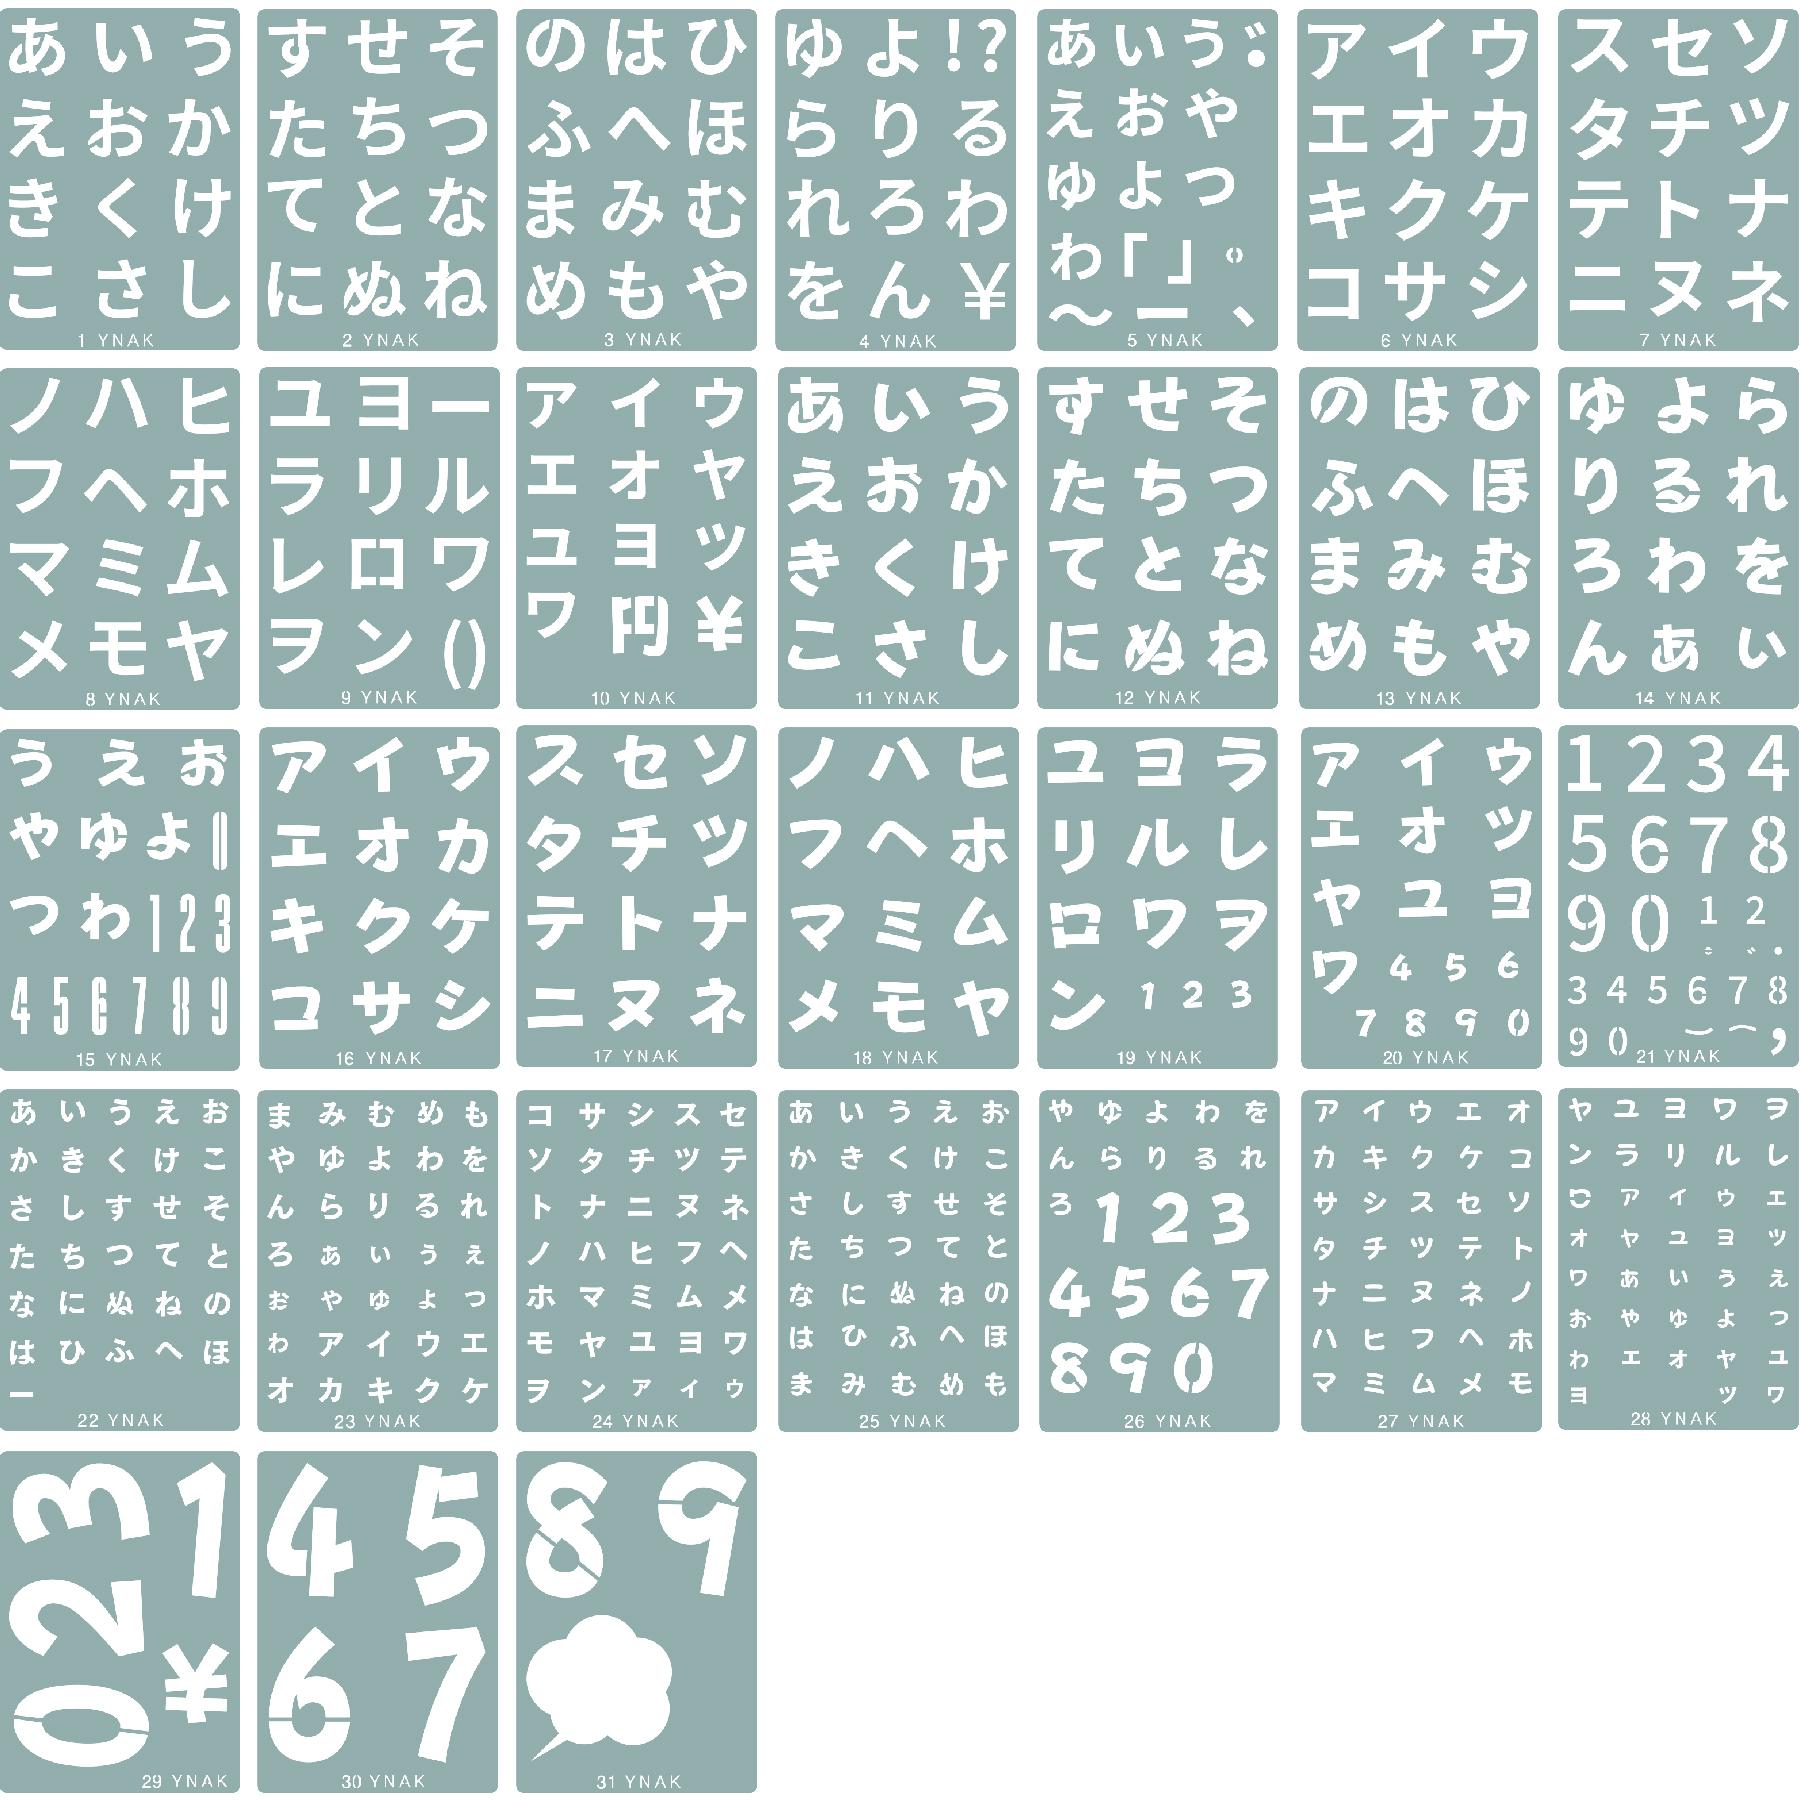 YNAK ステンシルシート テンプレート 型 ひらがな カタカナ 数字 日本語 大小文字 ステンシルプレート 店舗POP グリーティング ジャーナルカード 雑貨 リメイク DIY (21cm×15cm 31枚 セット)